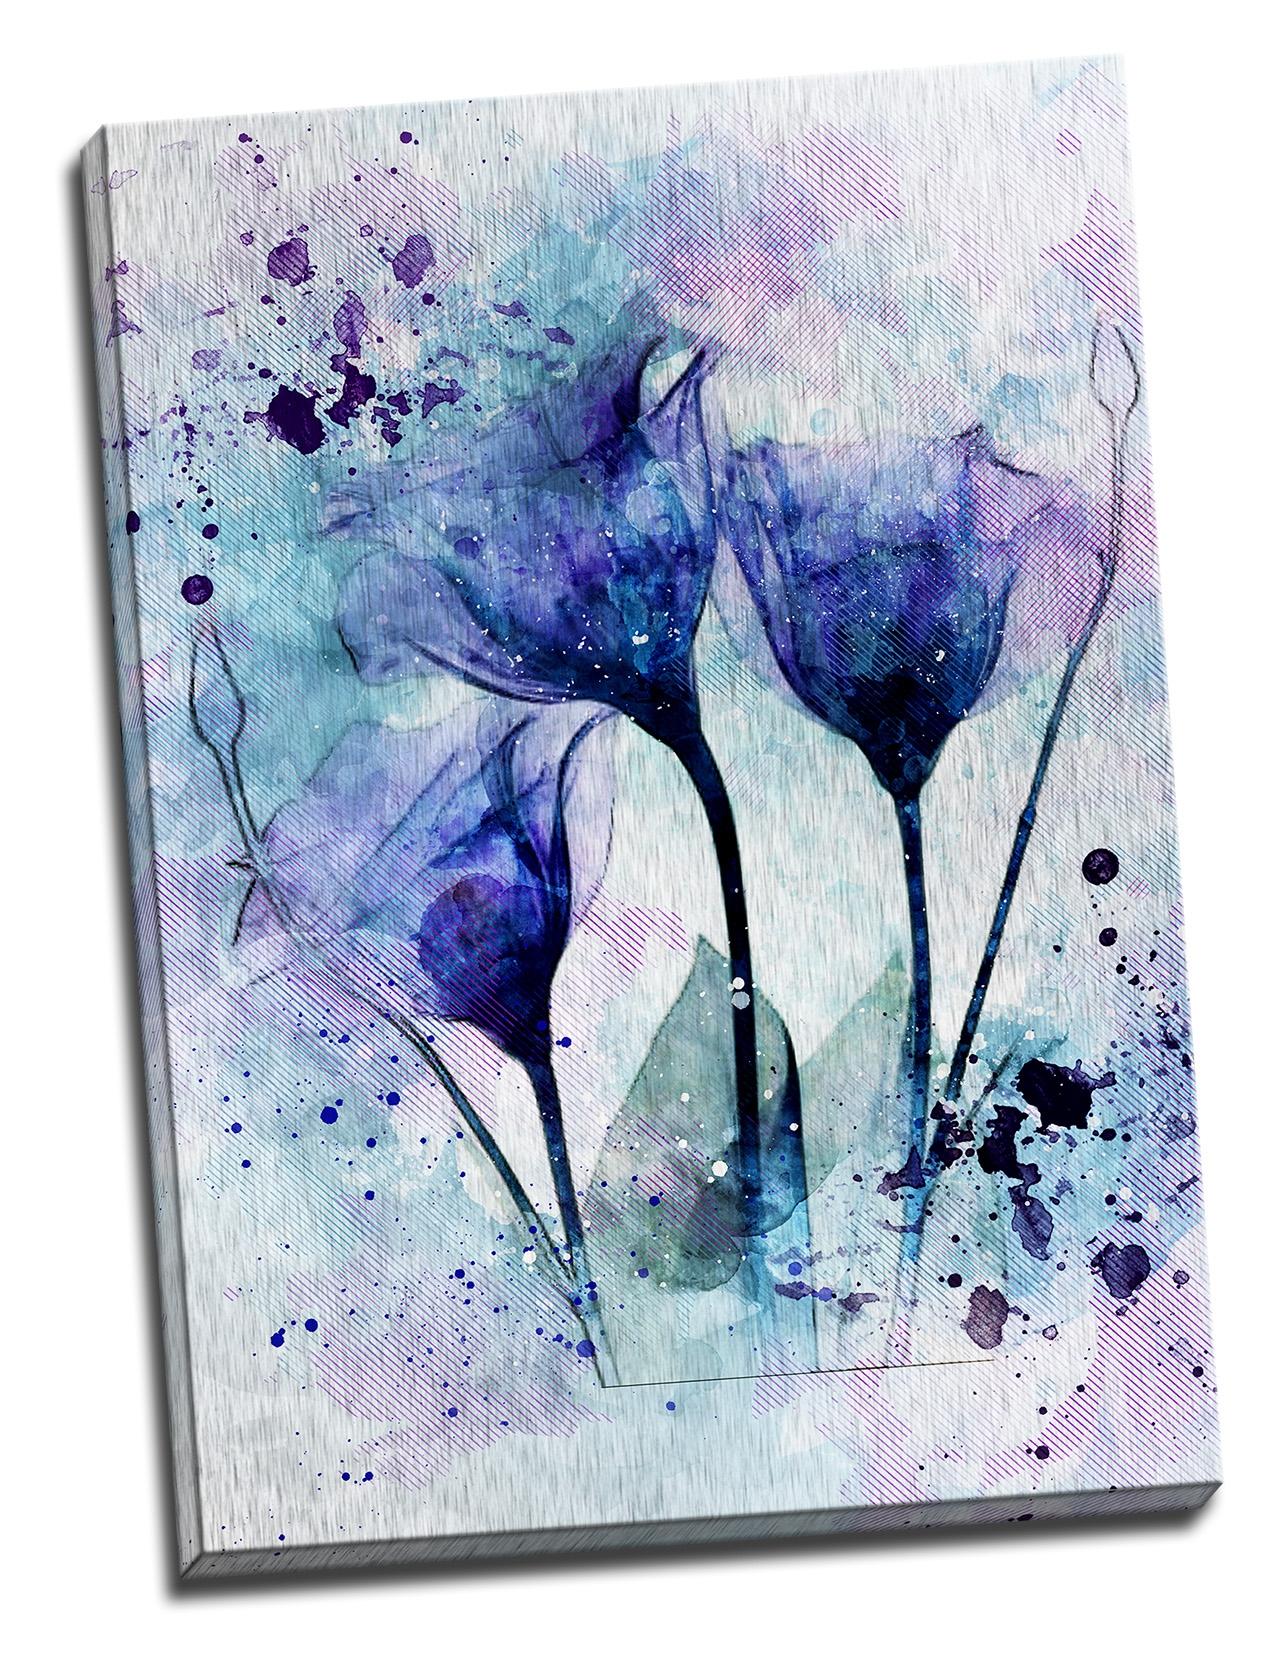 Tablou din aluminiu striat Blue Smoke Flowers